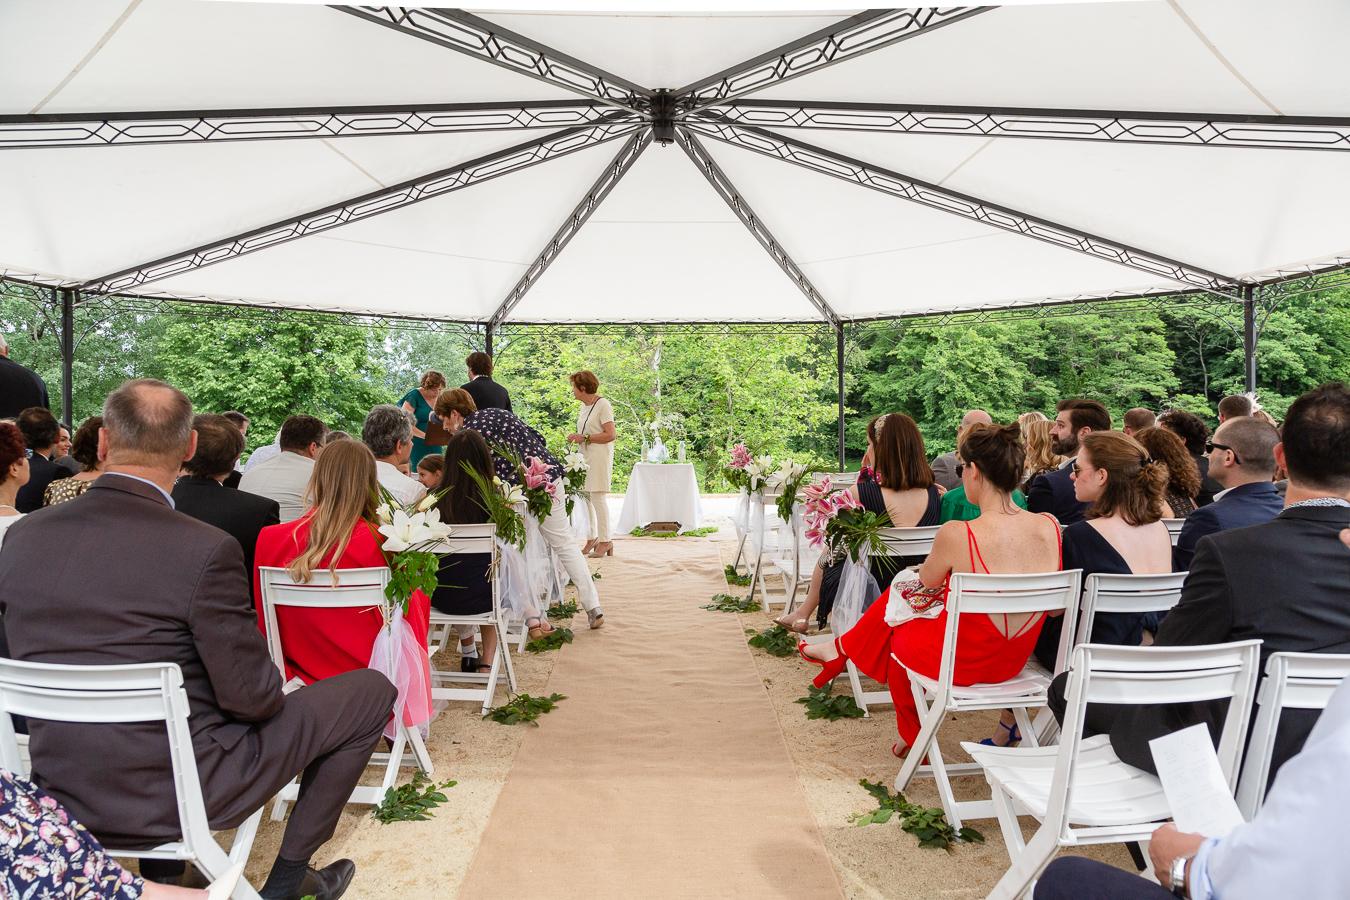 Wedding Party Chateau de Maulmont, Vichy, France